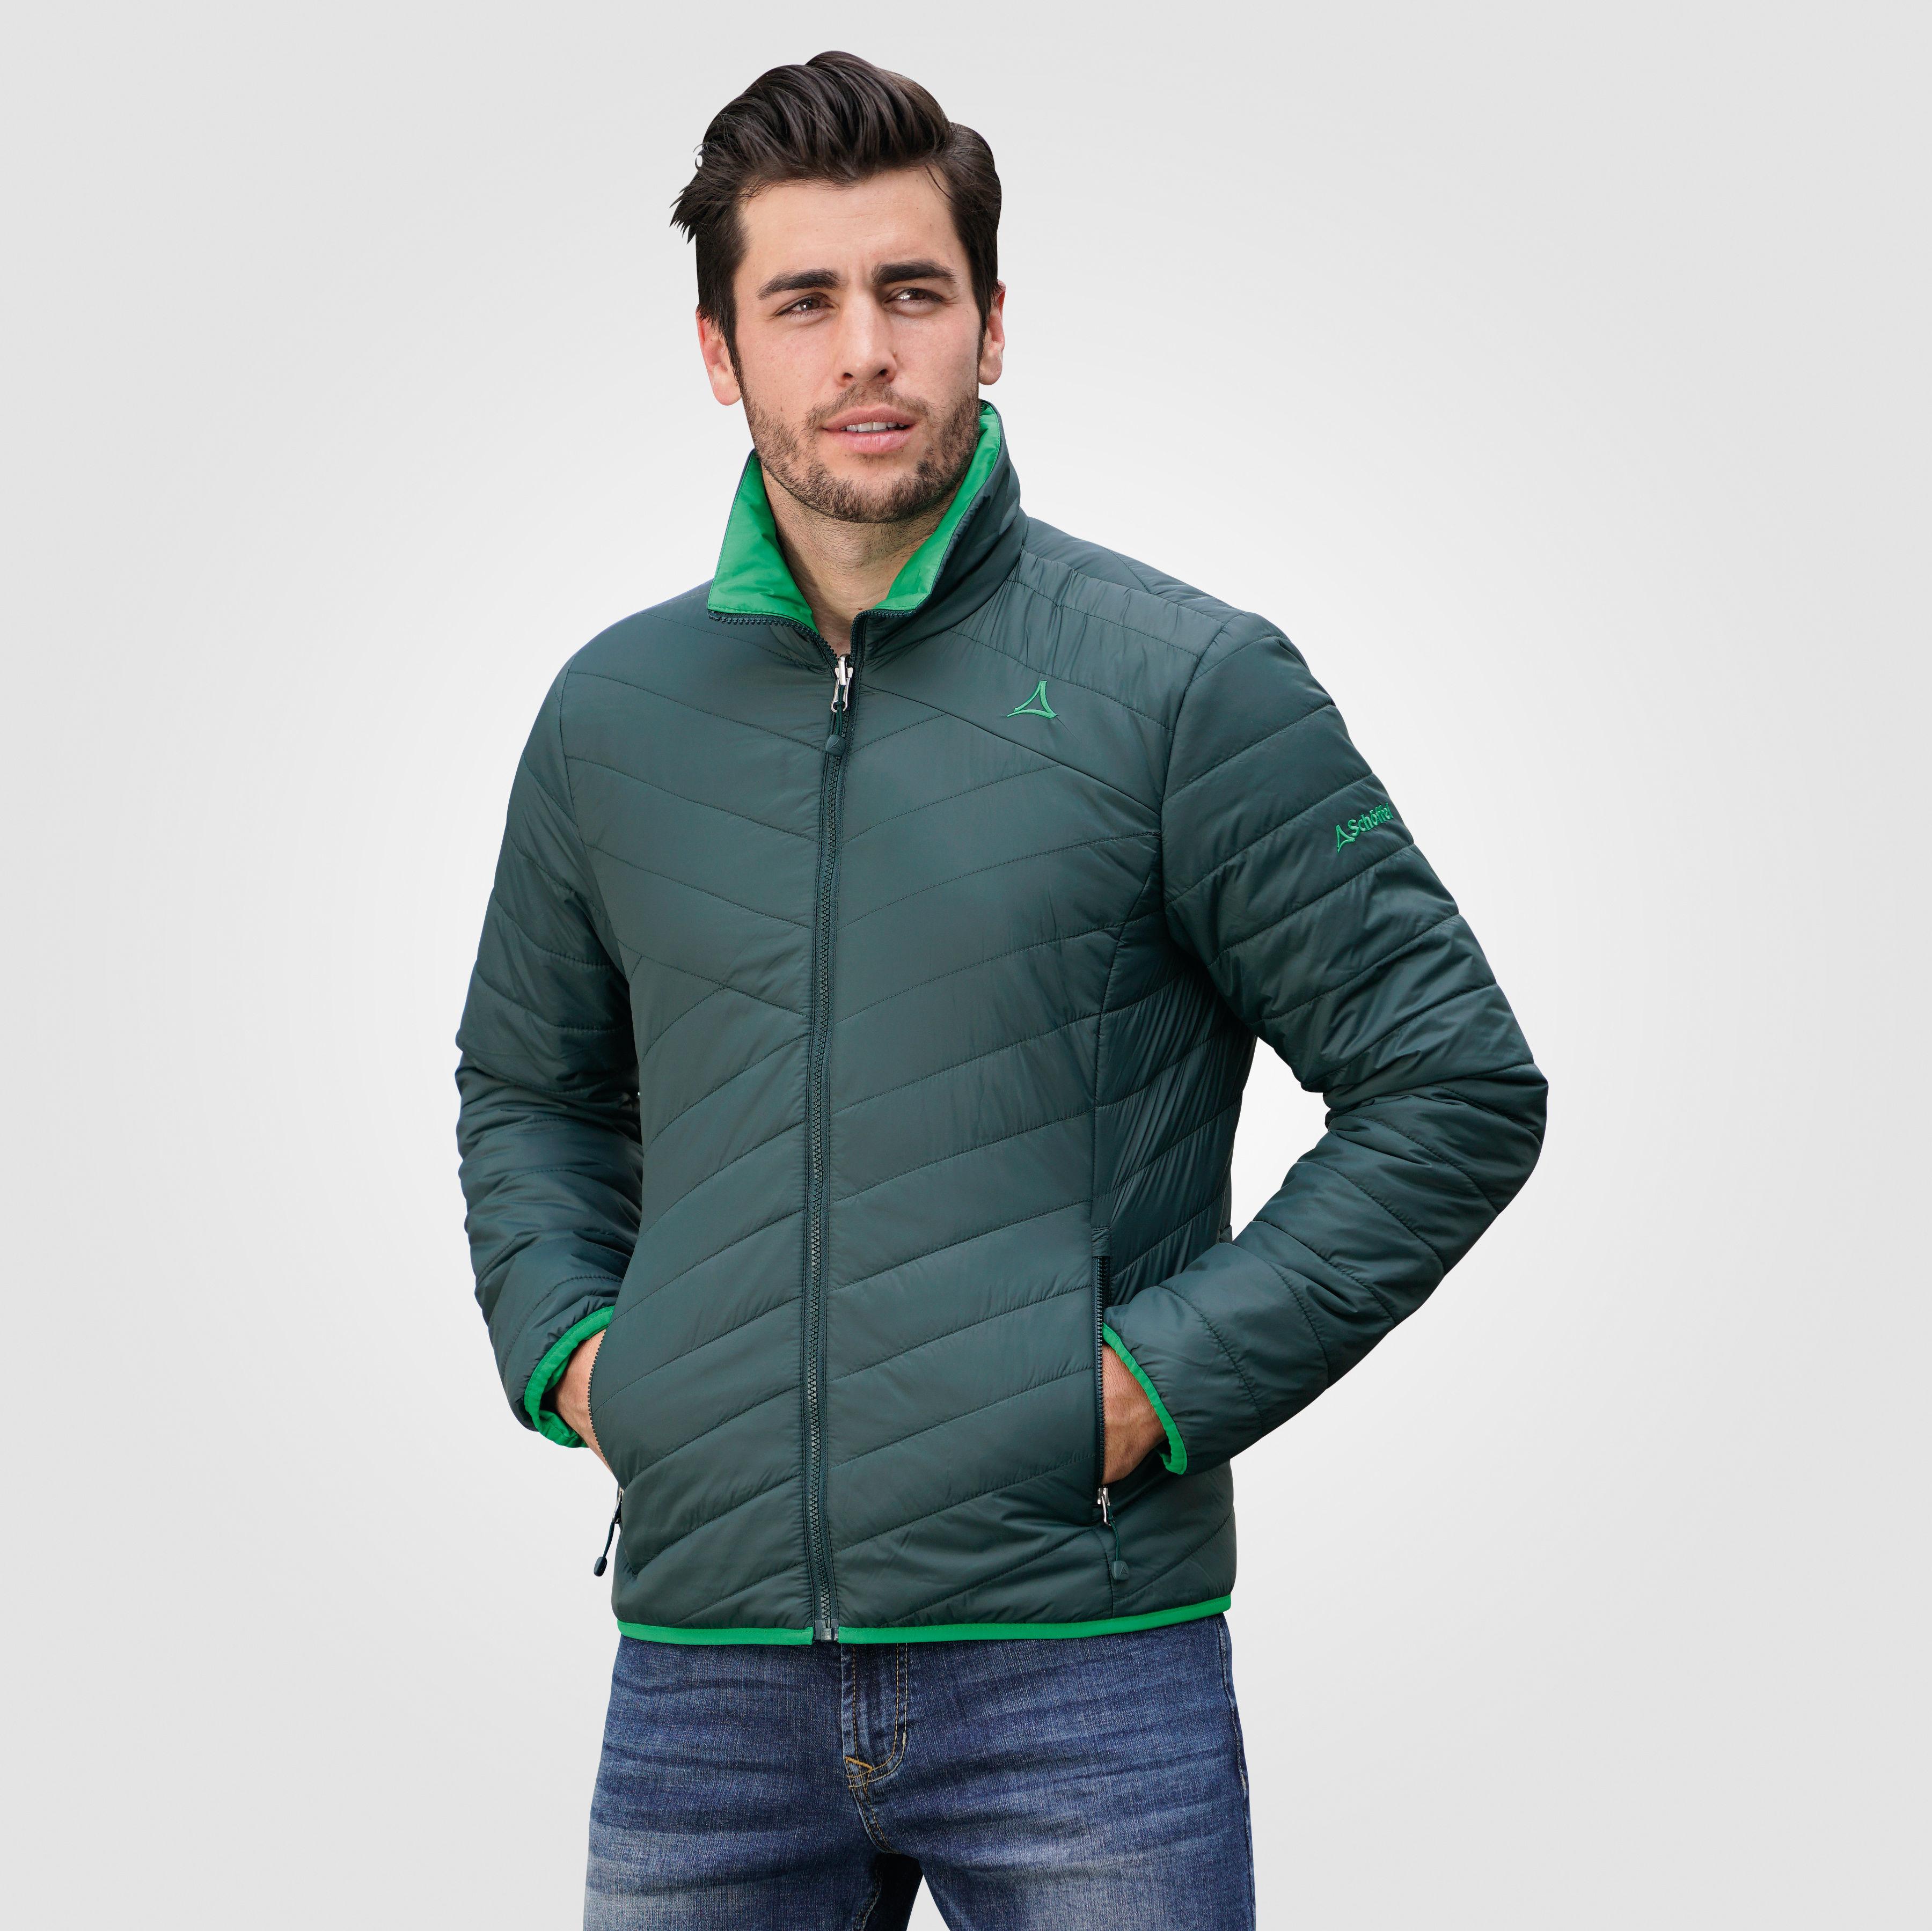 Schöffel Zip In Jacke Adamont 1